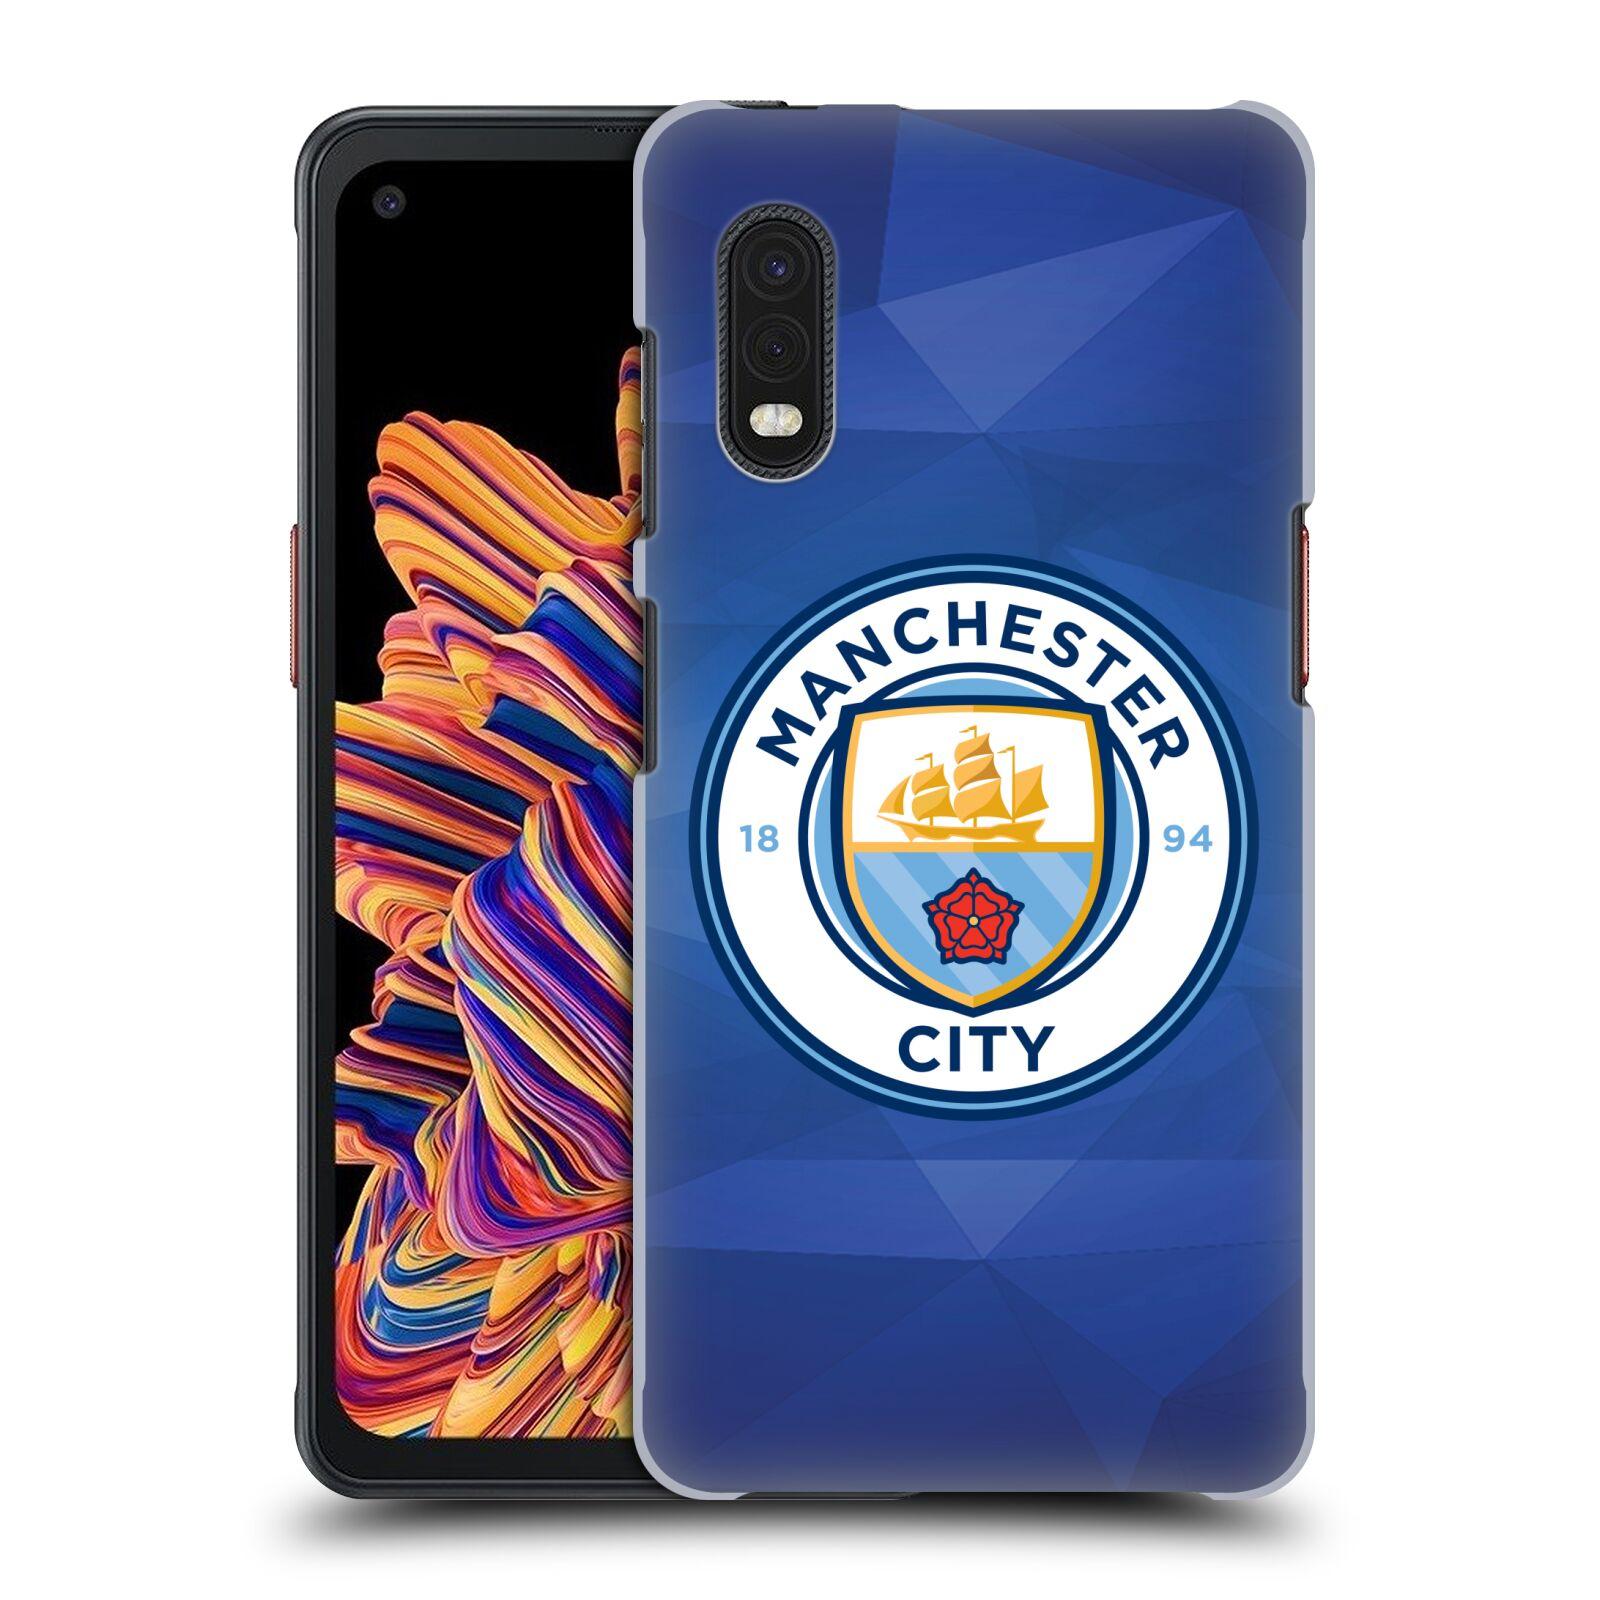 Plastové pouzdro na mobil Samsung Galaxy Xcover Pro - Head Case - Manchester City FC - Modré nové logo